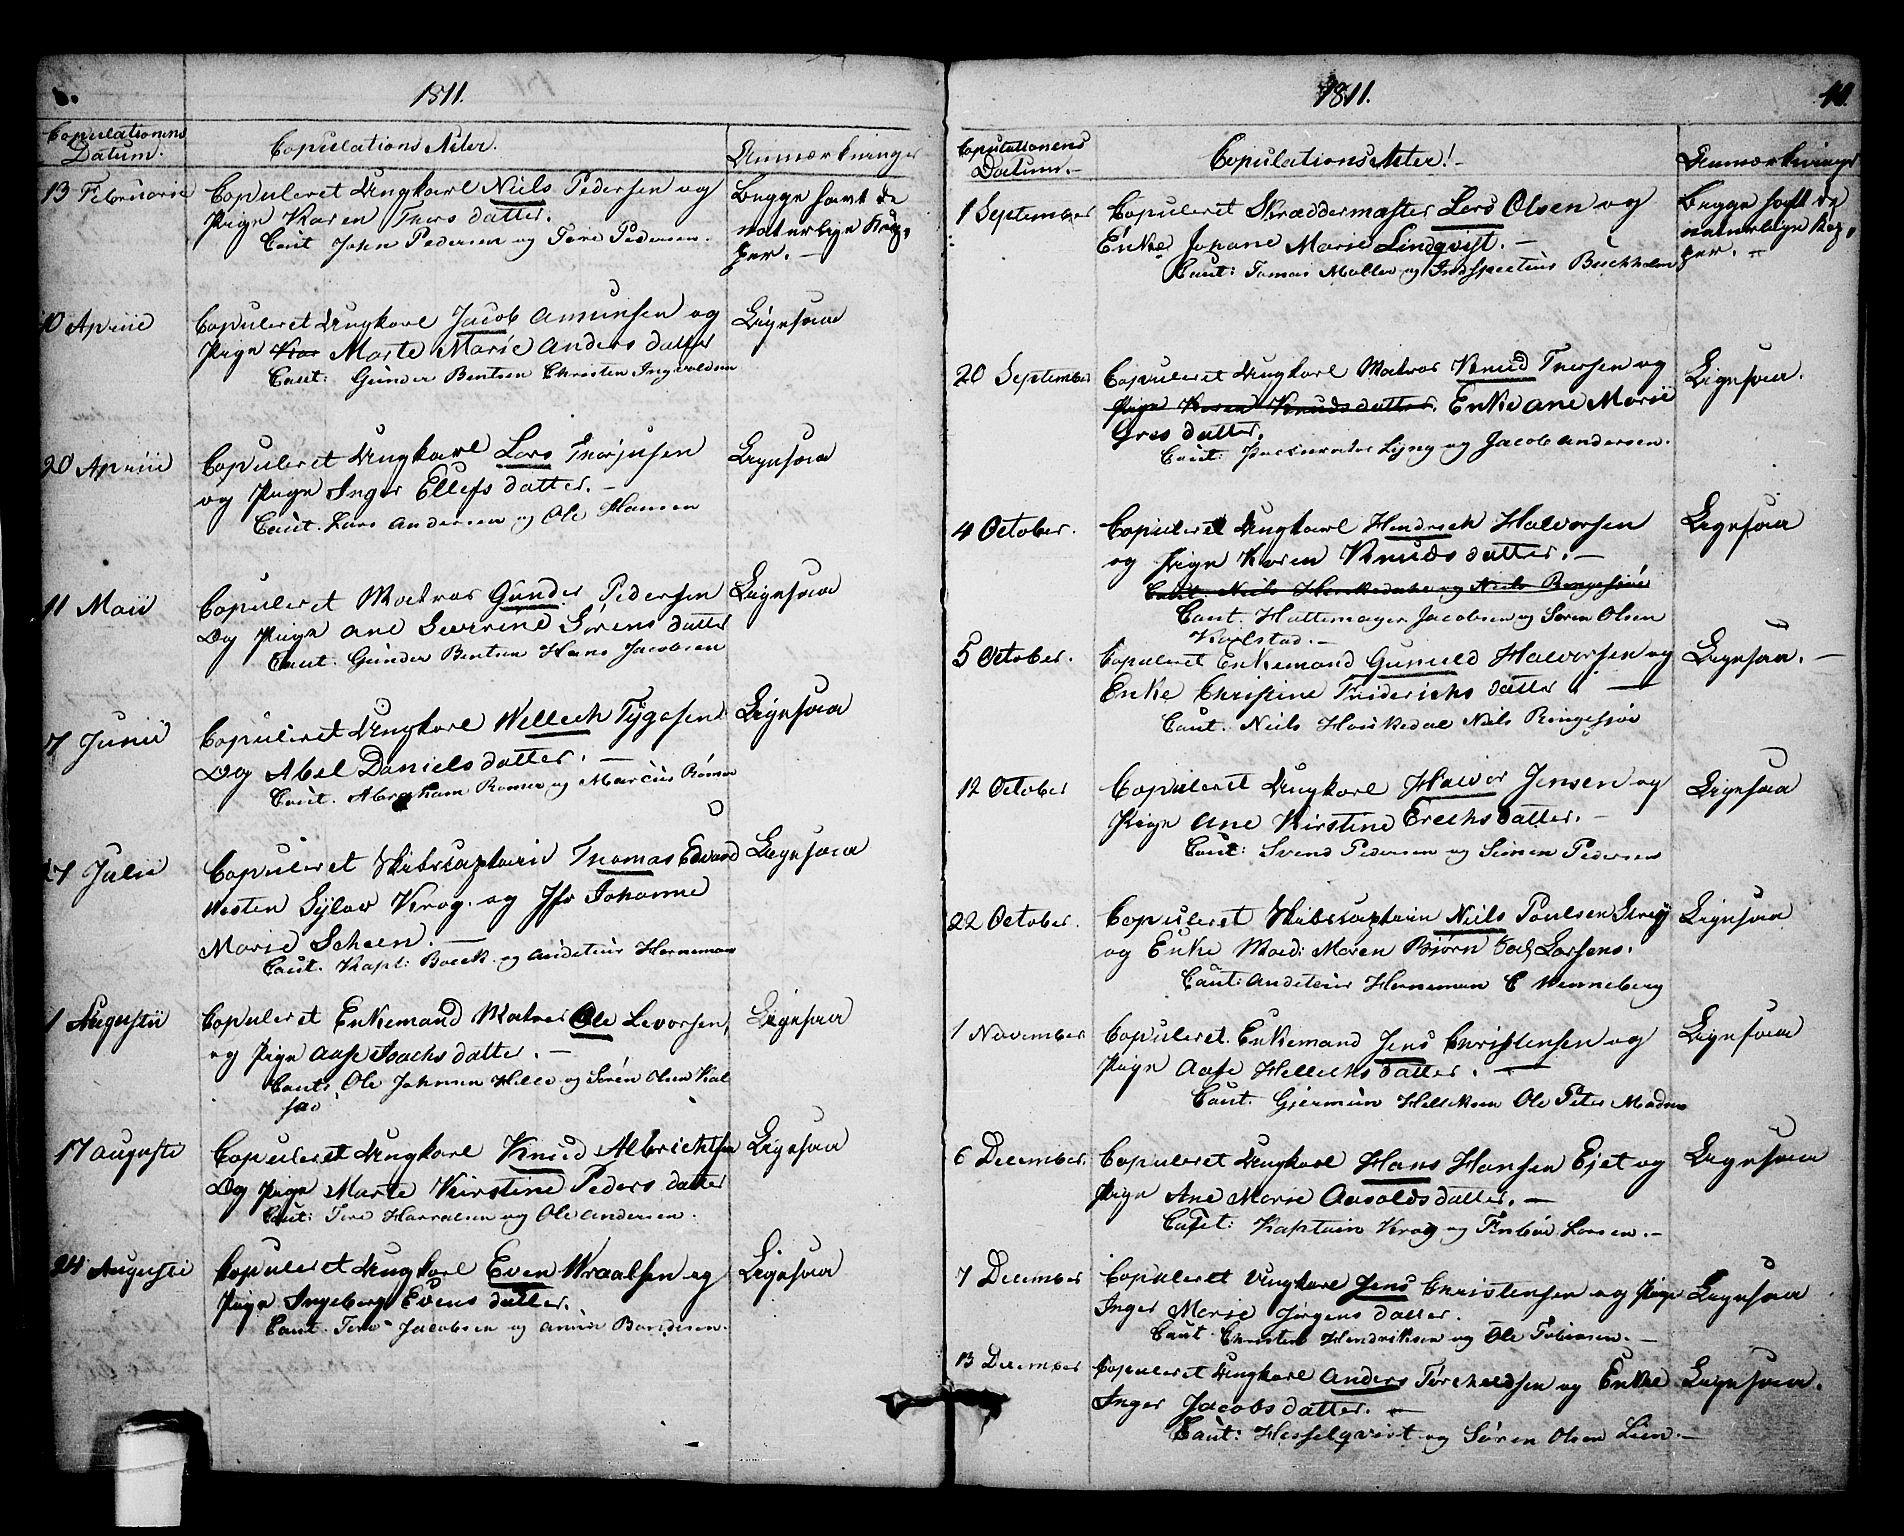 SAKO, Kragerø kirkebøker, F/Fa/L0003: Ministerialbok nr. 3, 1802-1813, s. 41